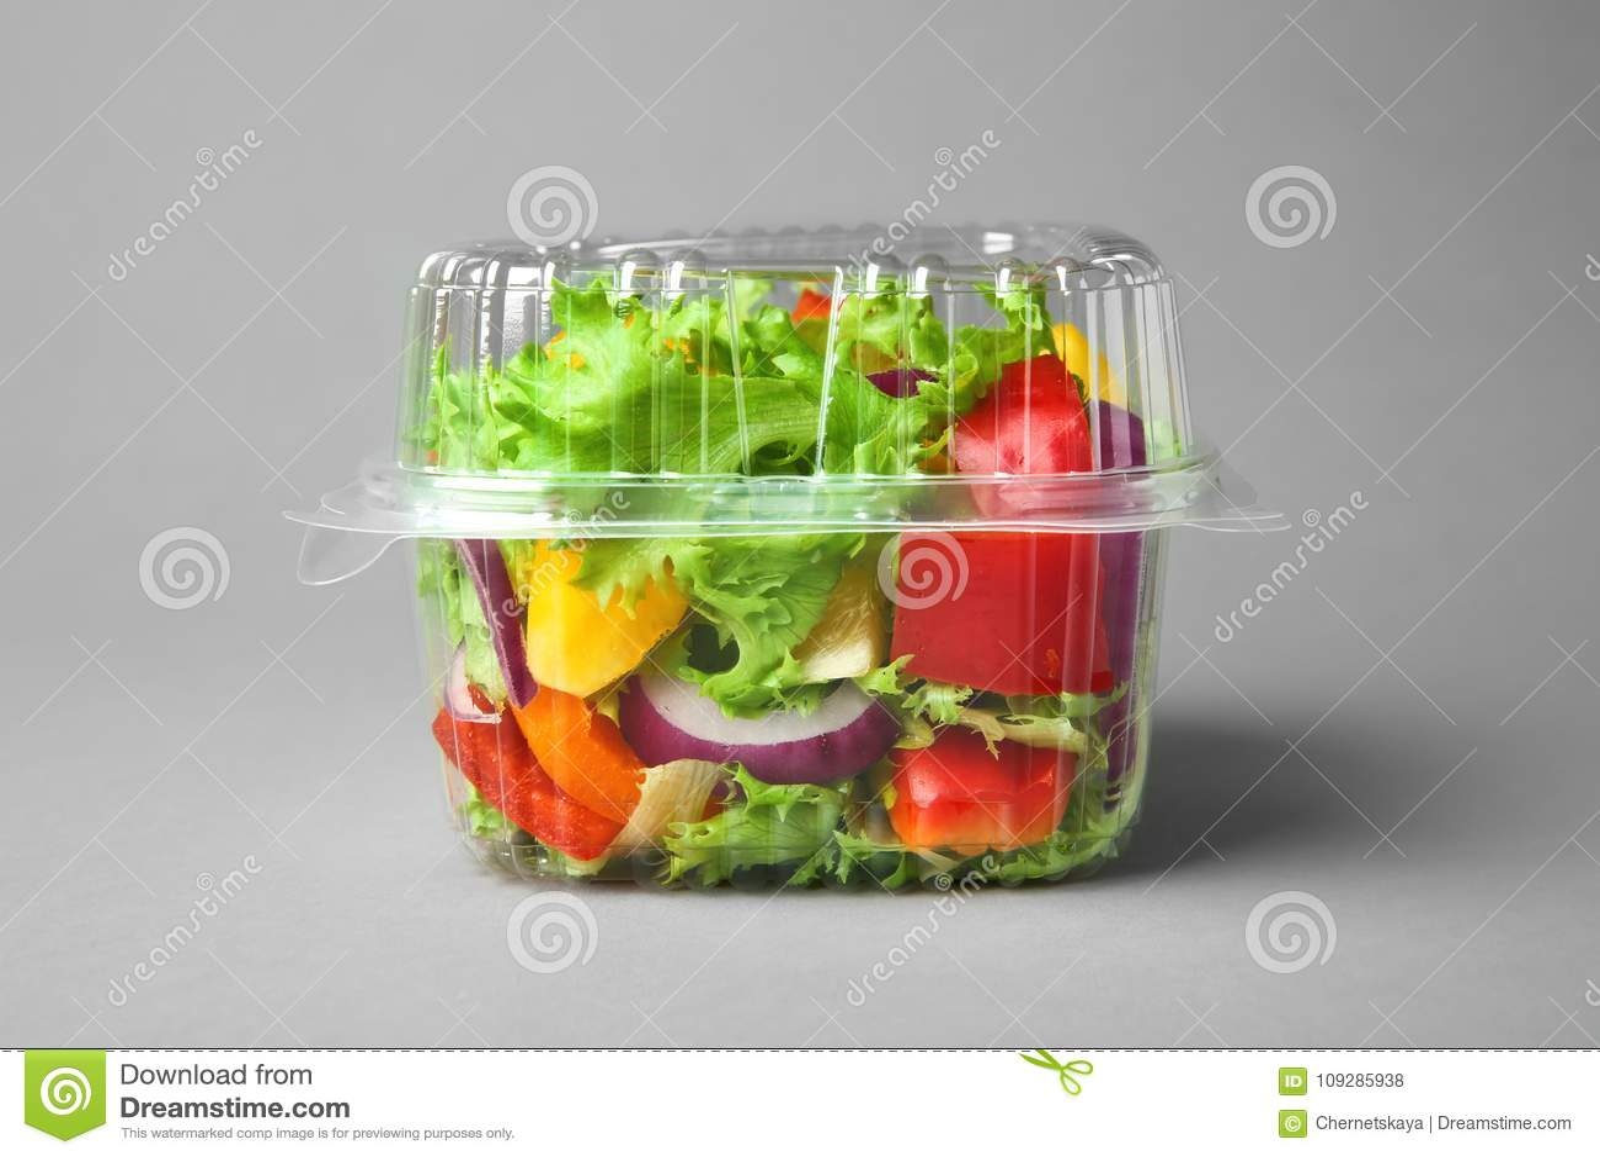 Recipiente plástico com salada